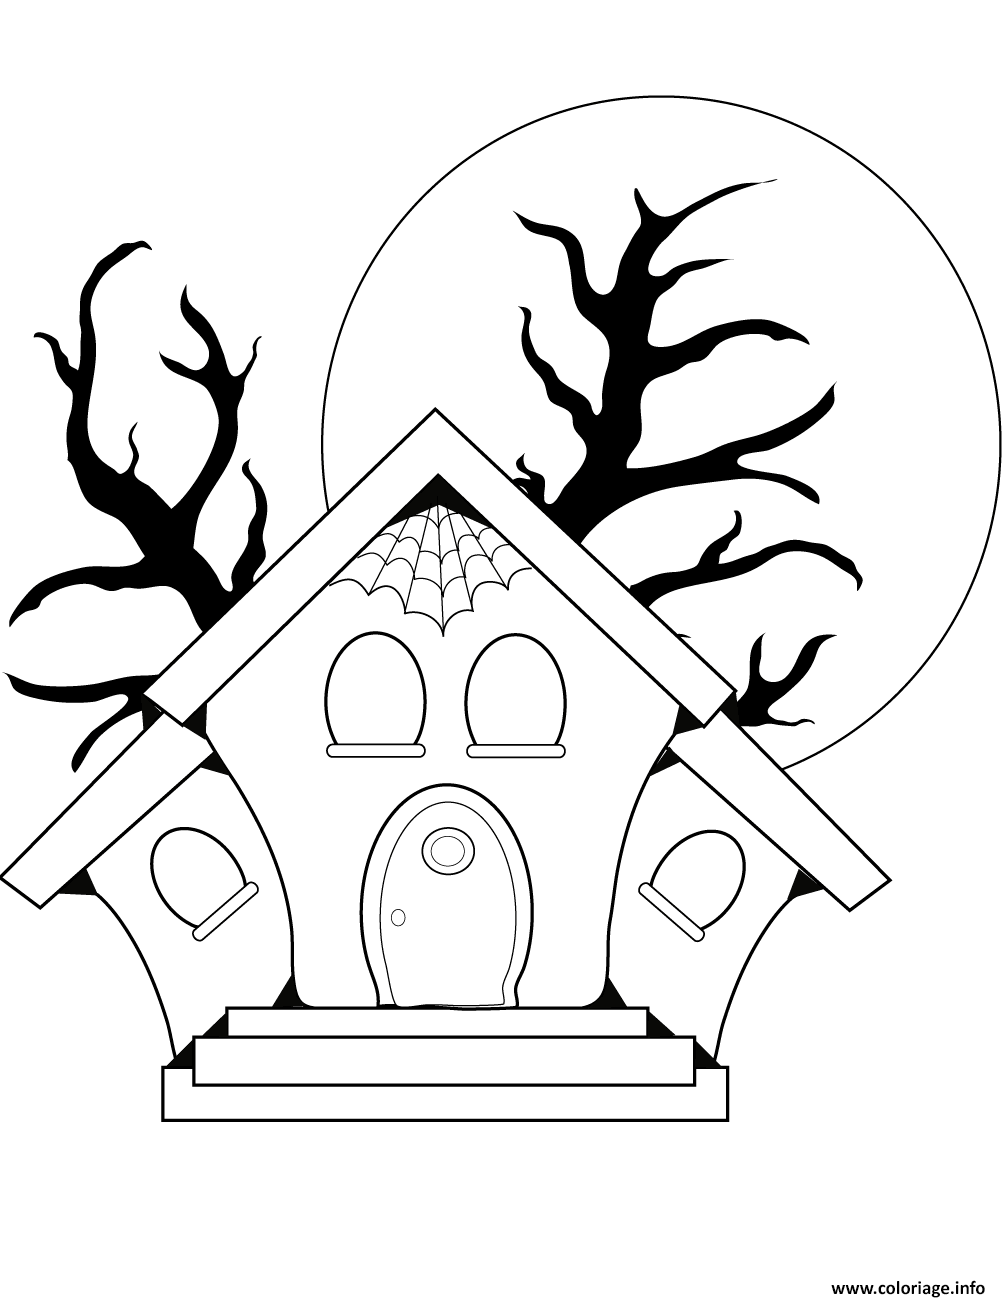 Coloriage maison hantee halloween - Dessins maison ...